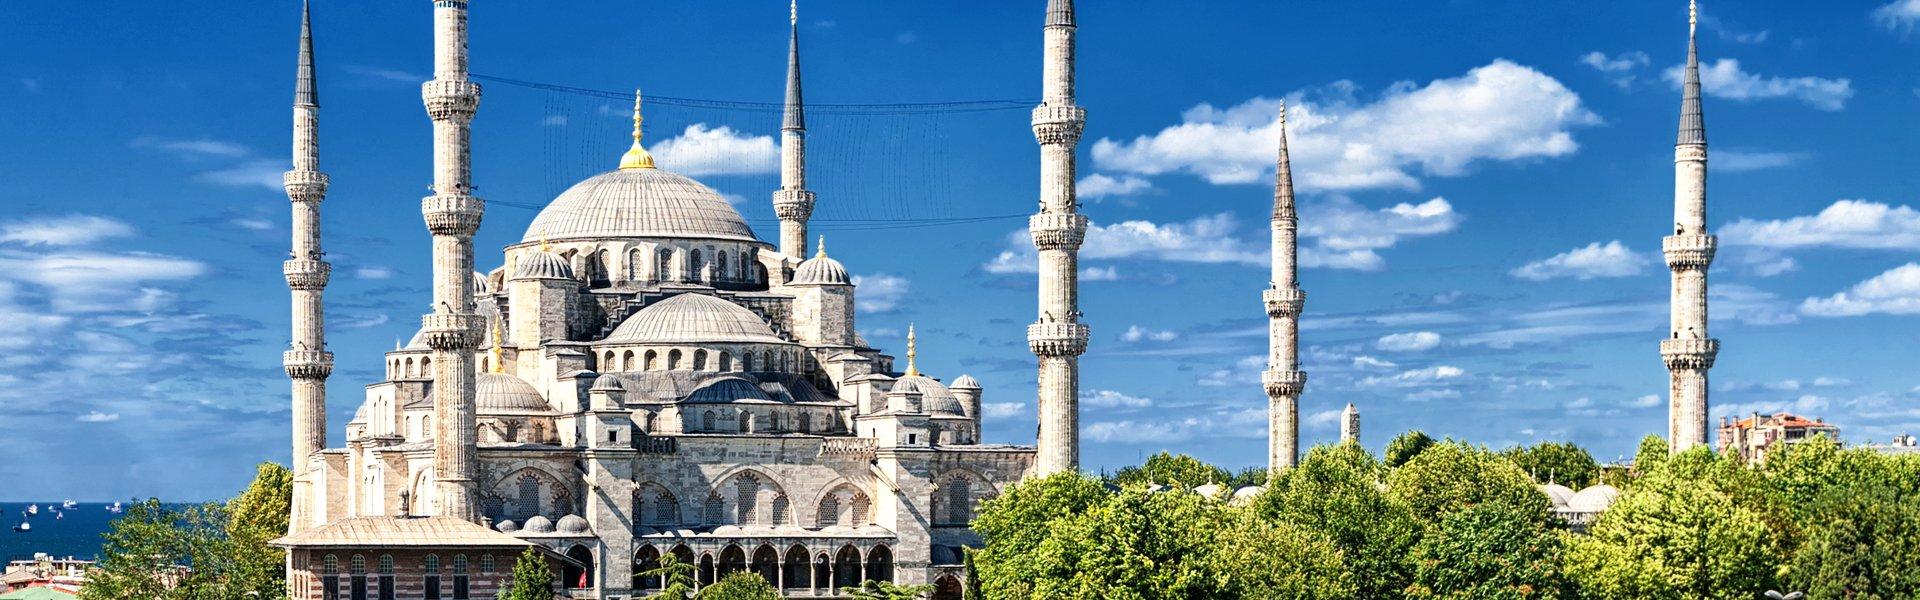 Blauwe Moskee in Istanbul, Turkije